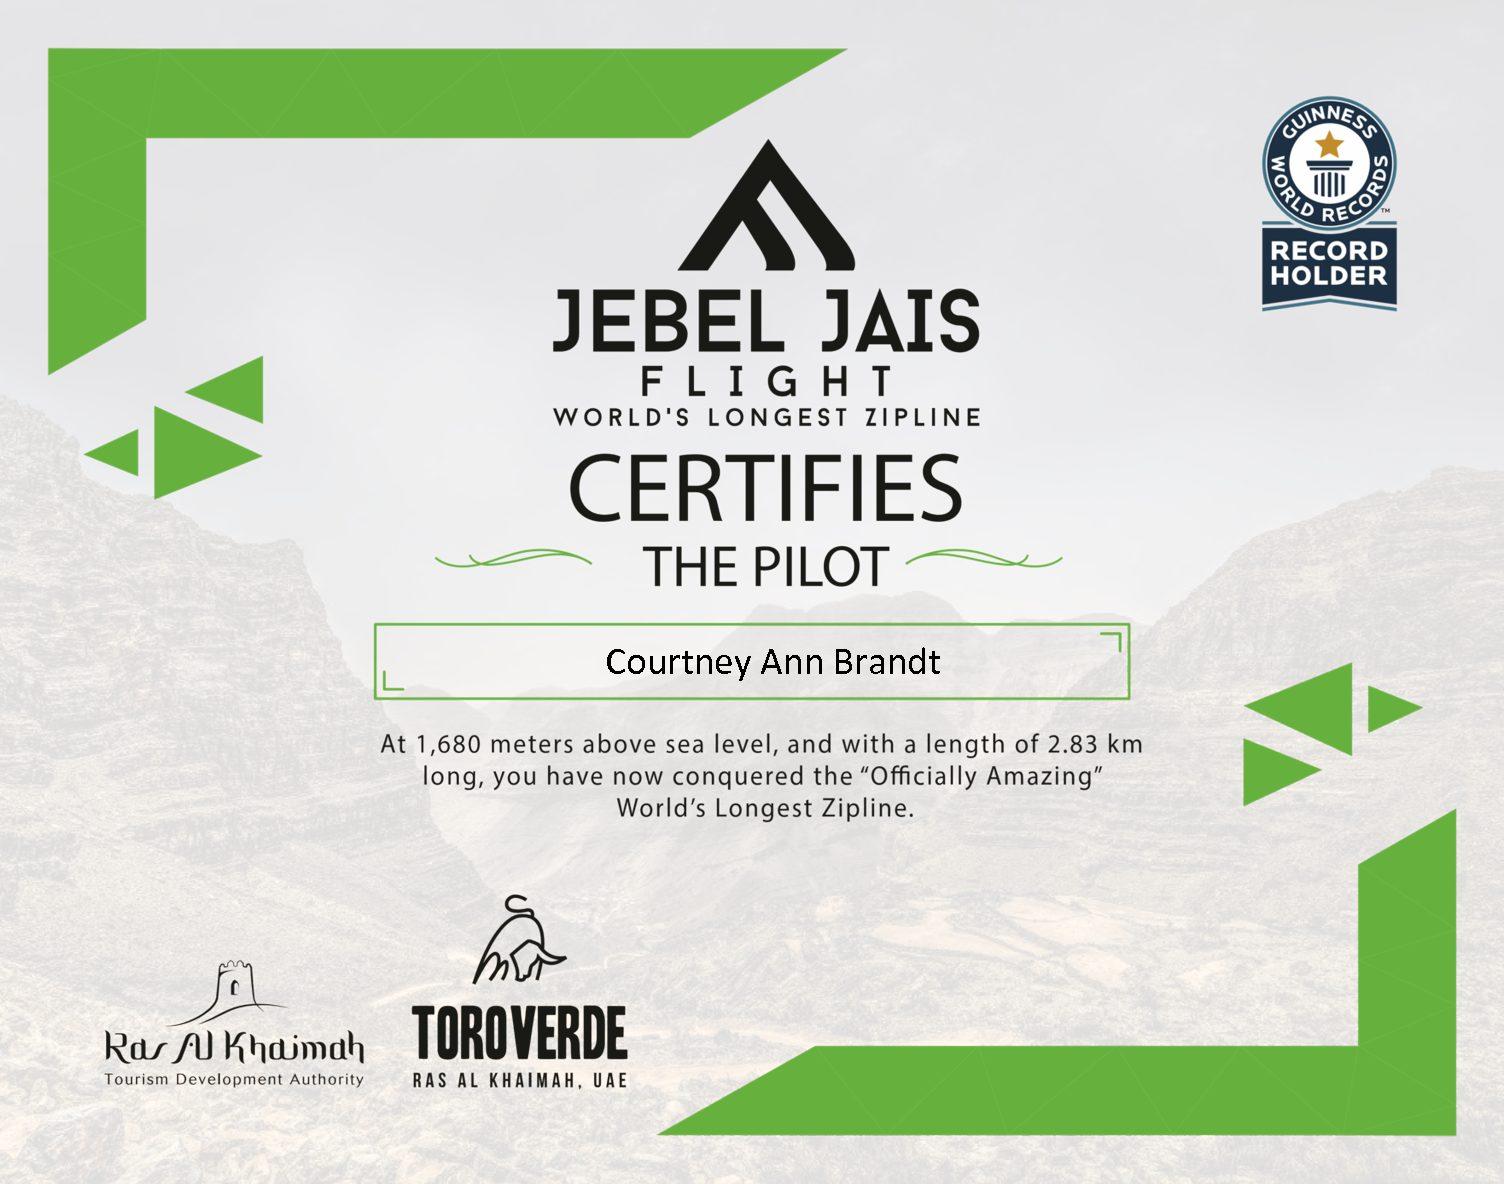 Jebel Jais Flight: The world's longest zipline.